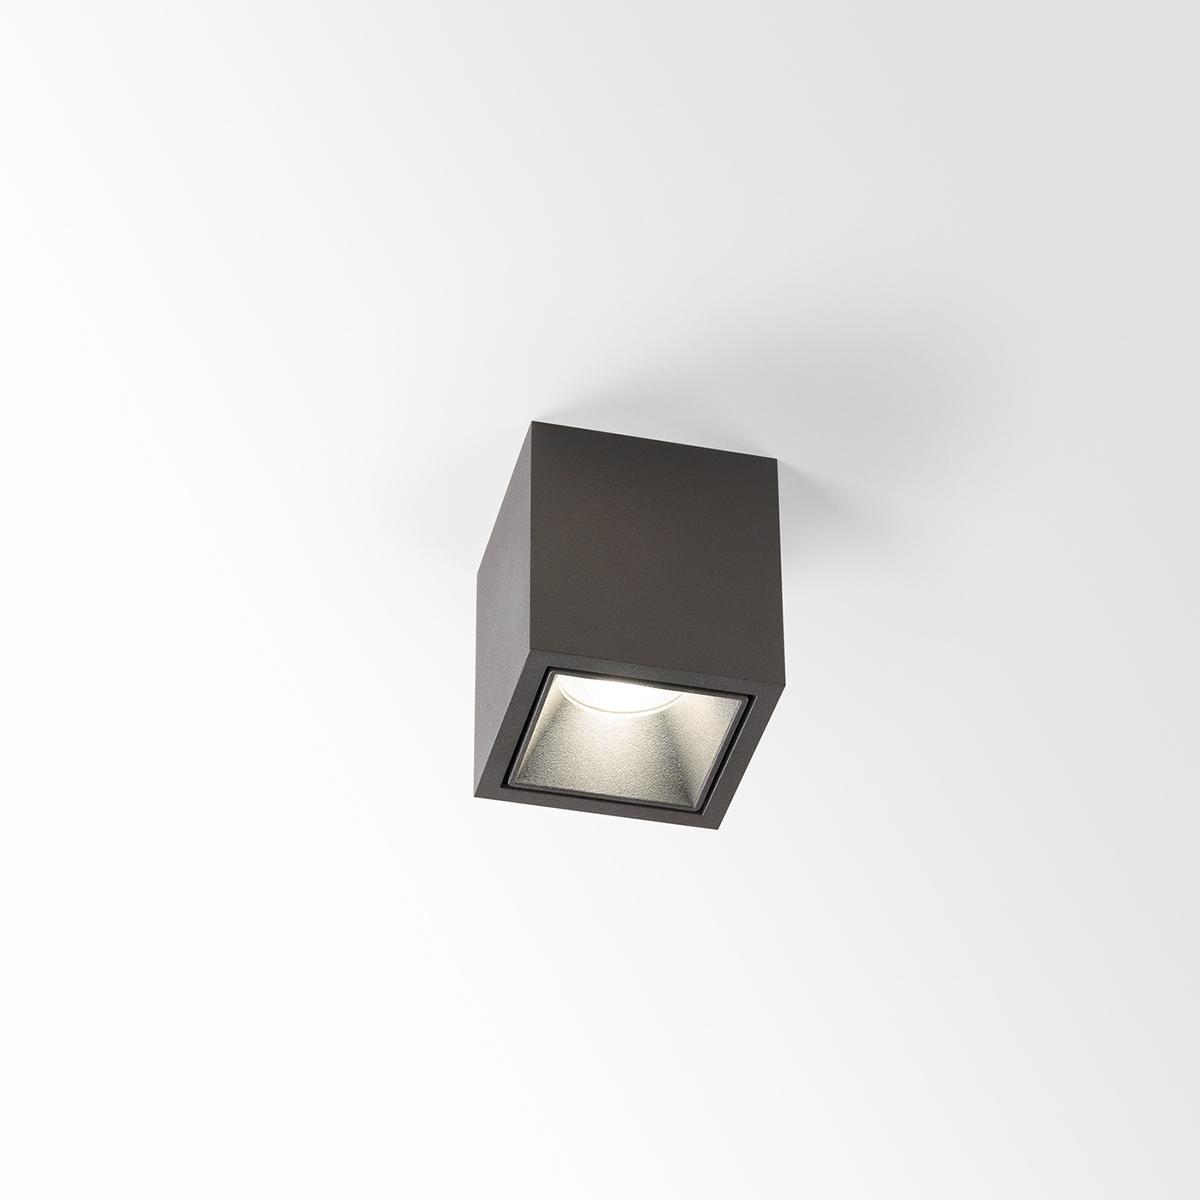 Boxy L+ LED Deckenleuchte